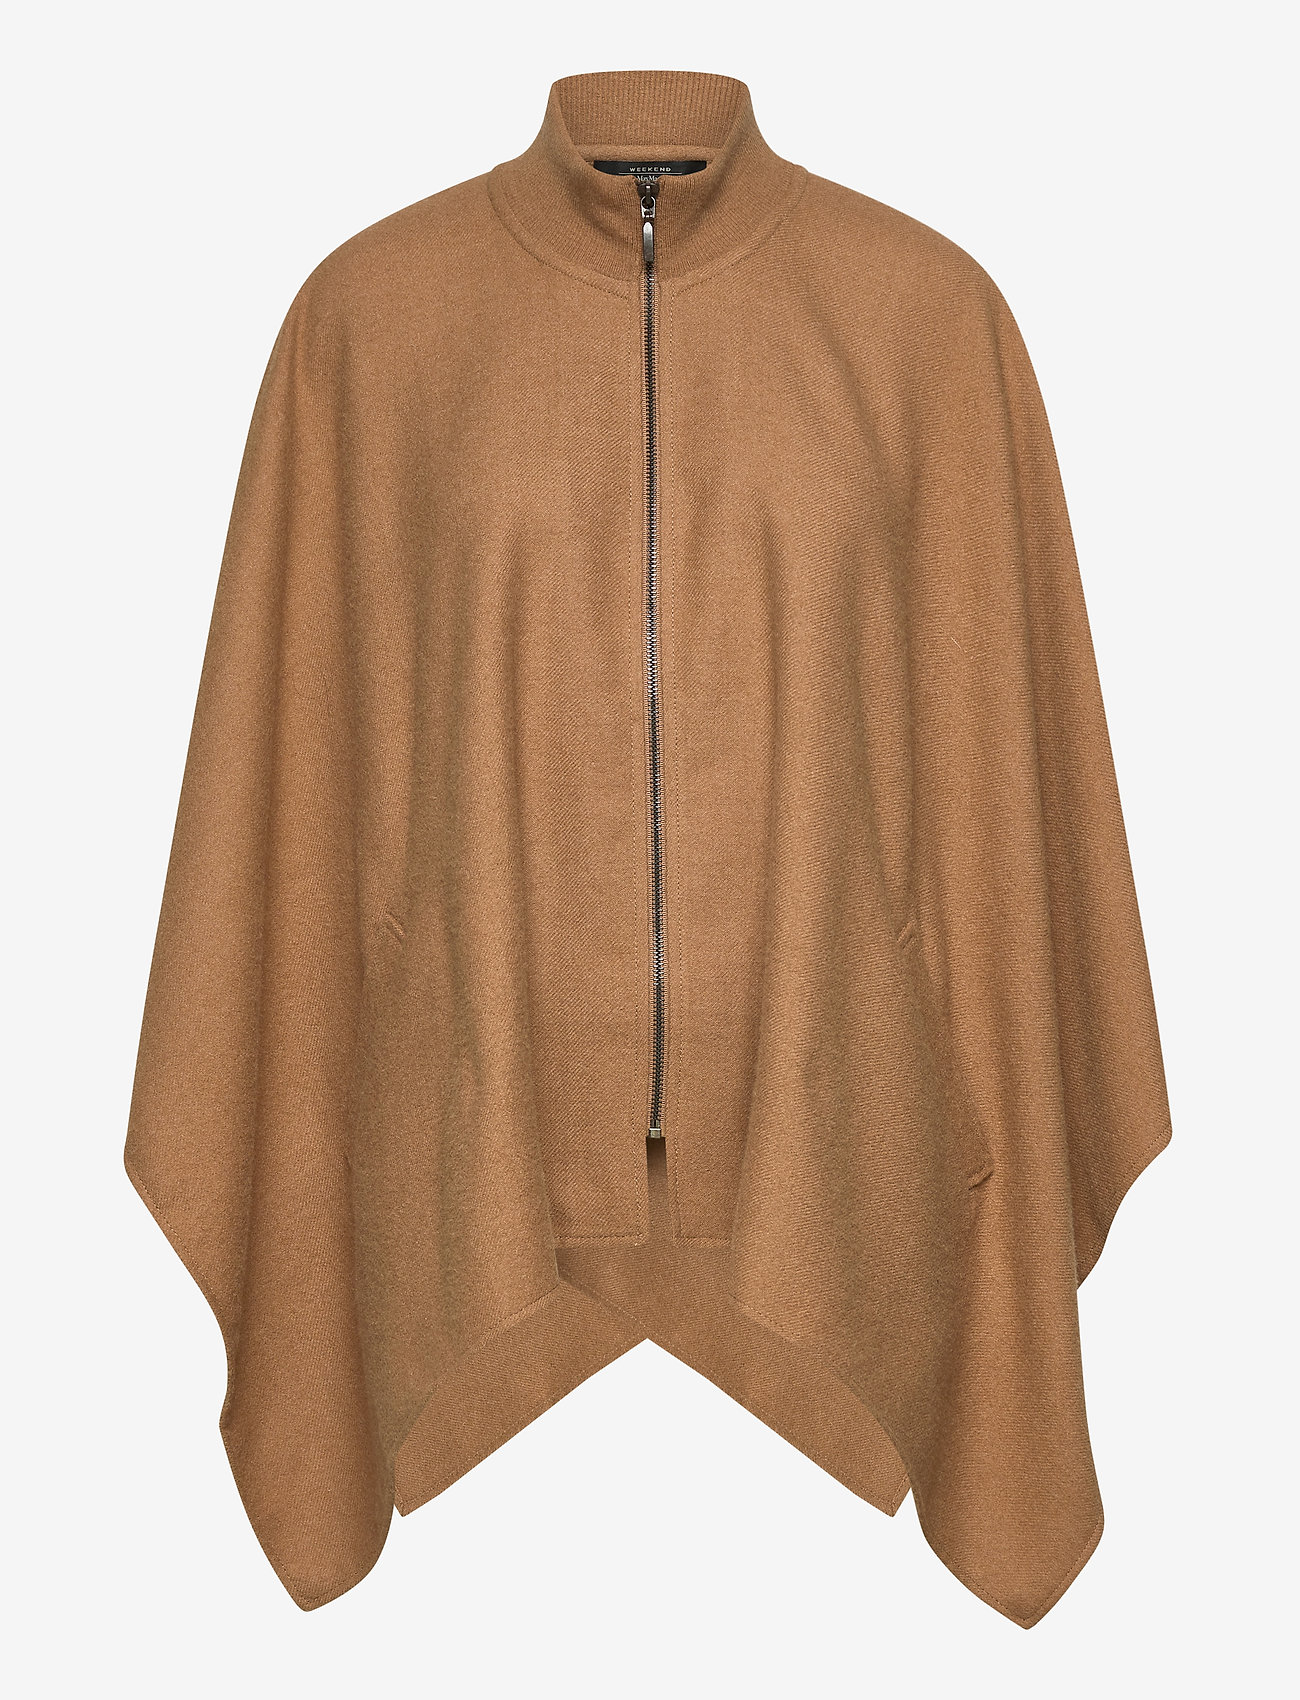 Weekend Max Mara - NOME - ponchos & capes - camel - 0